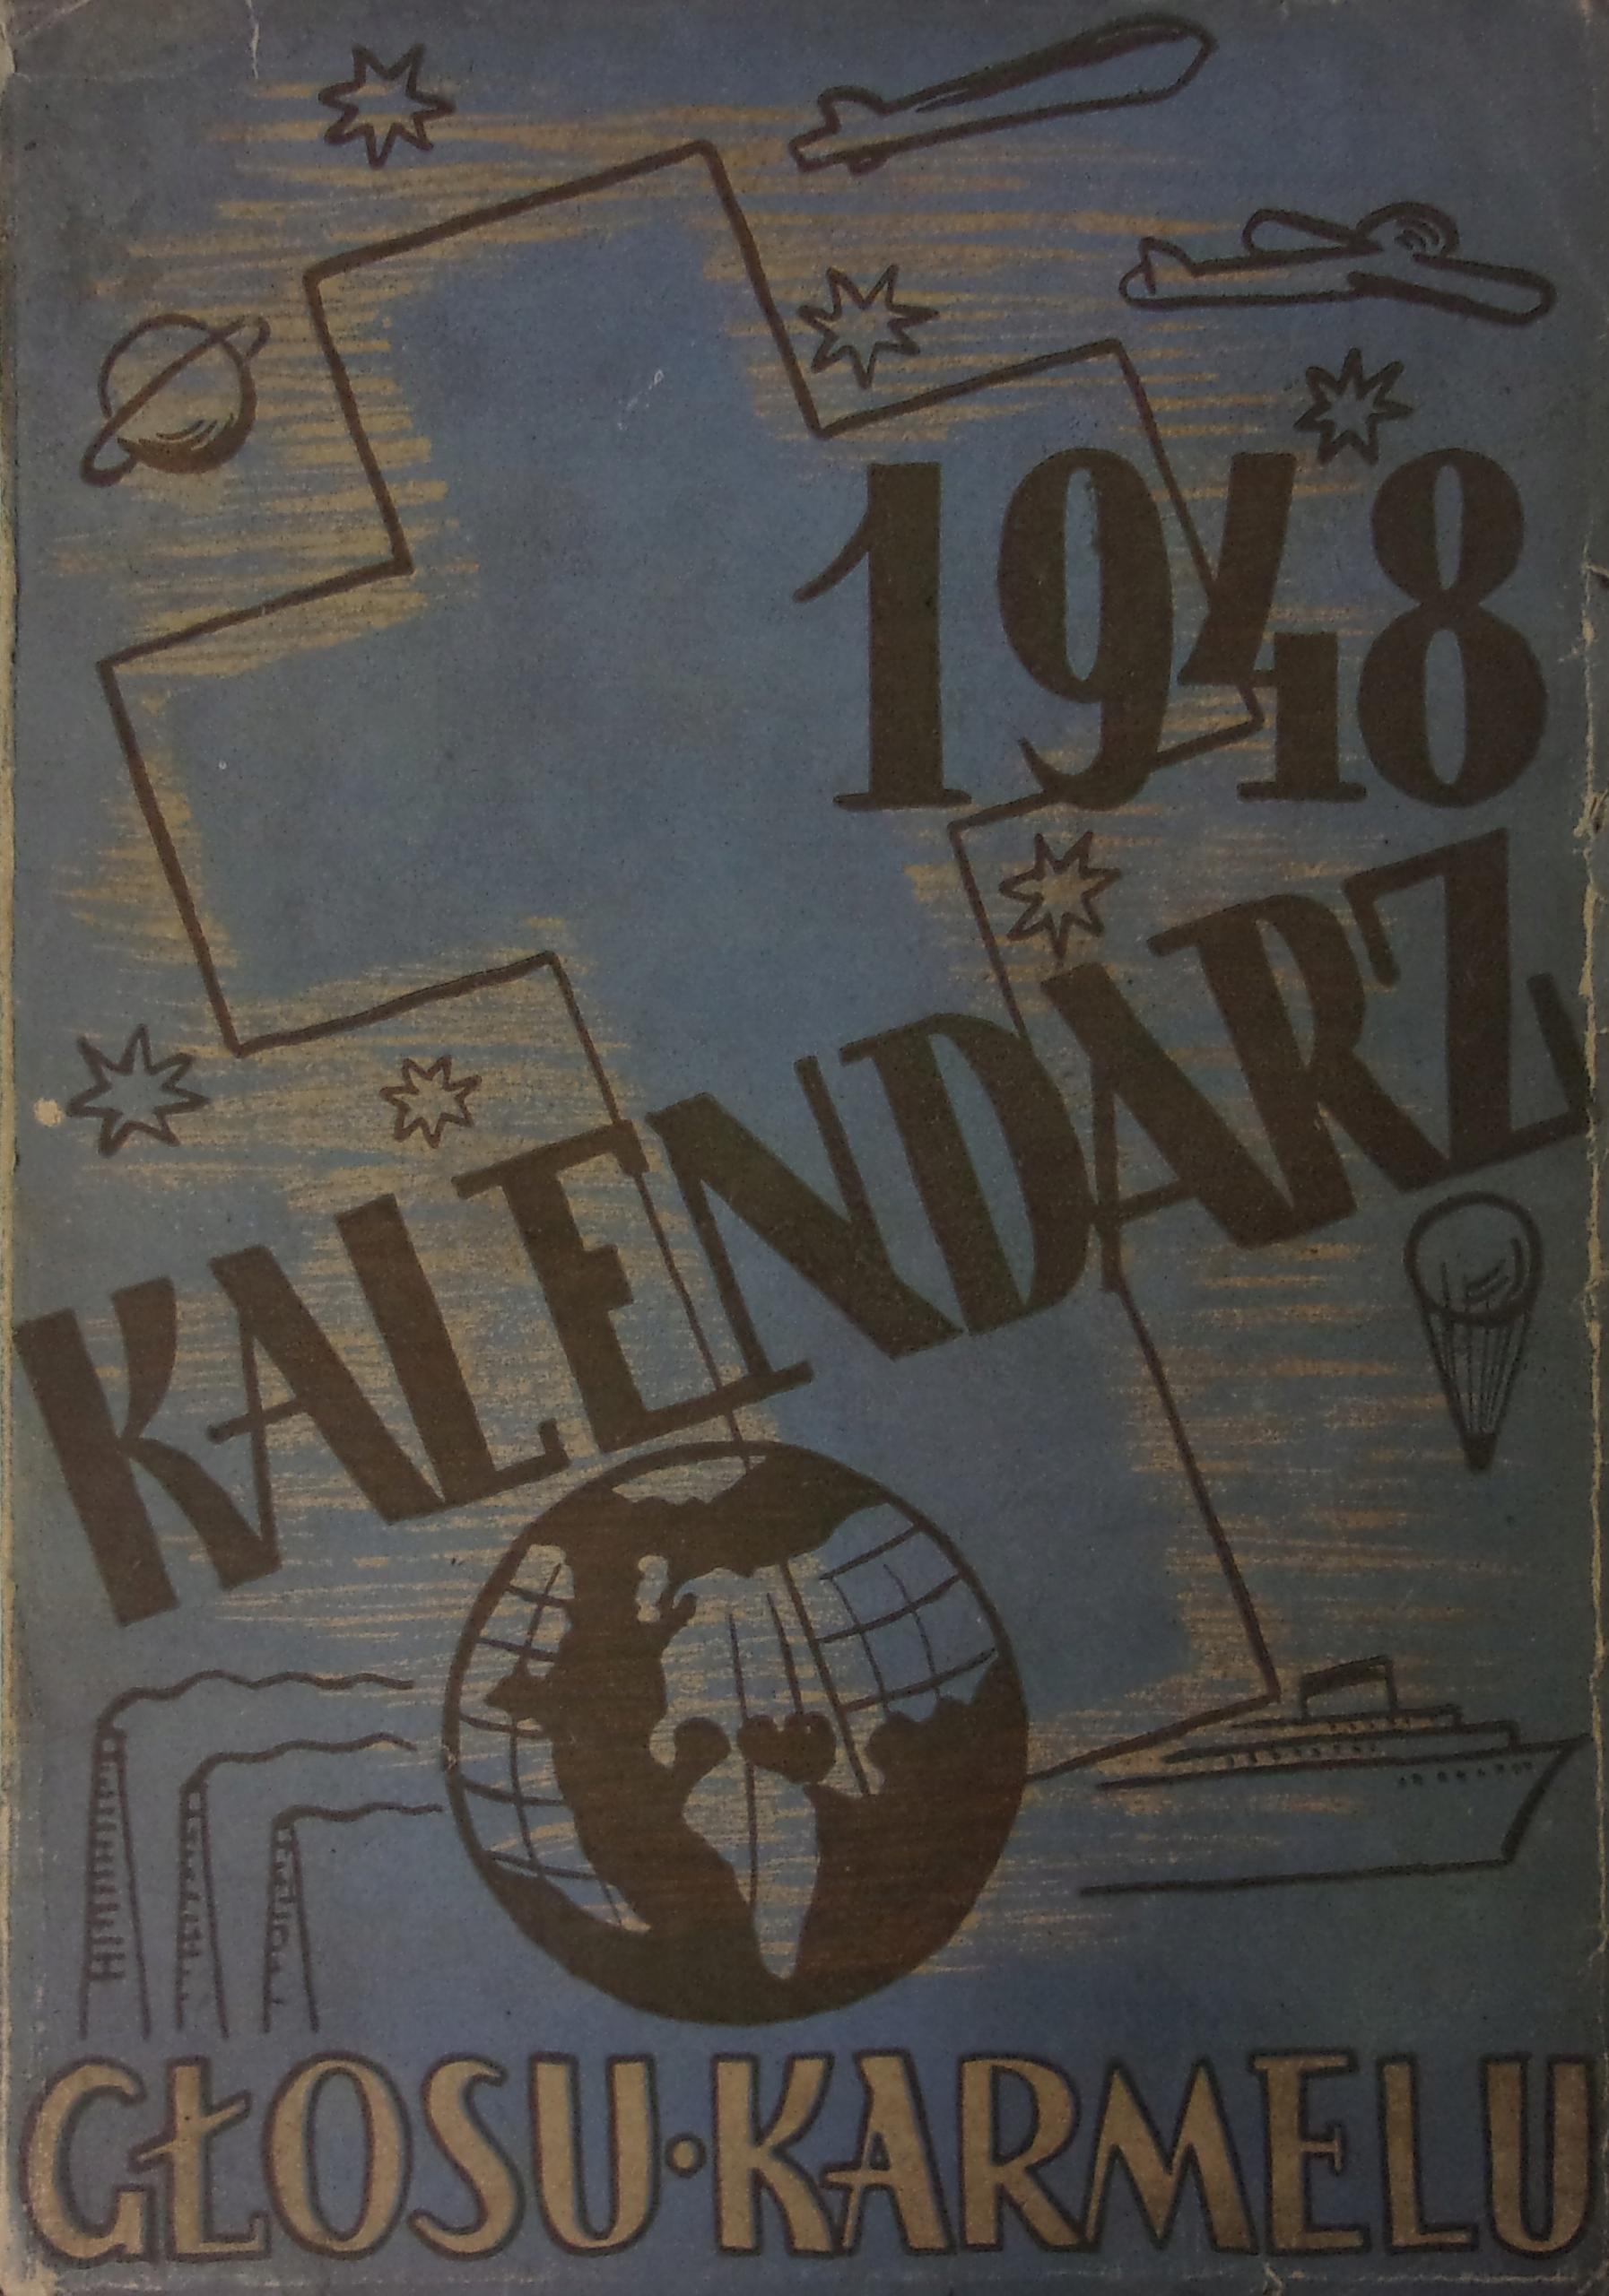 Kalendarz głosu karmelu 1948r.